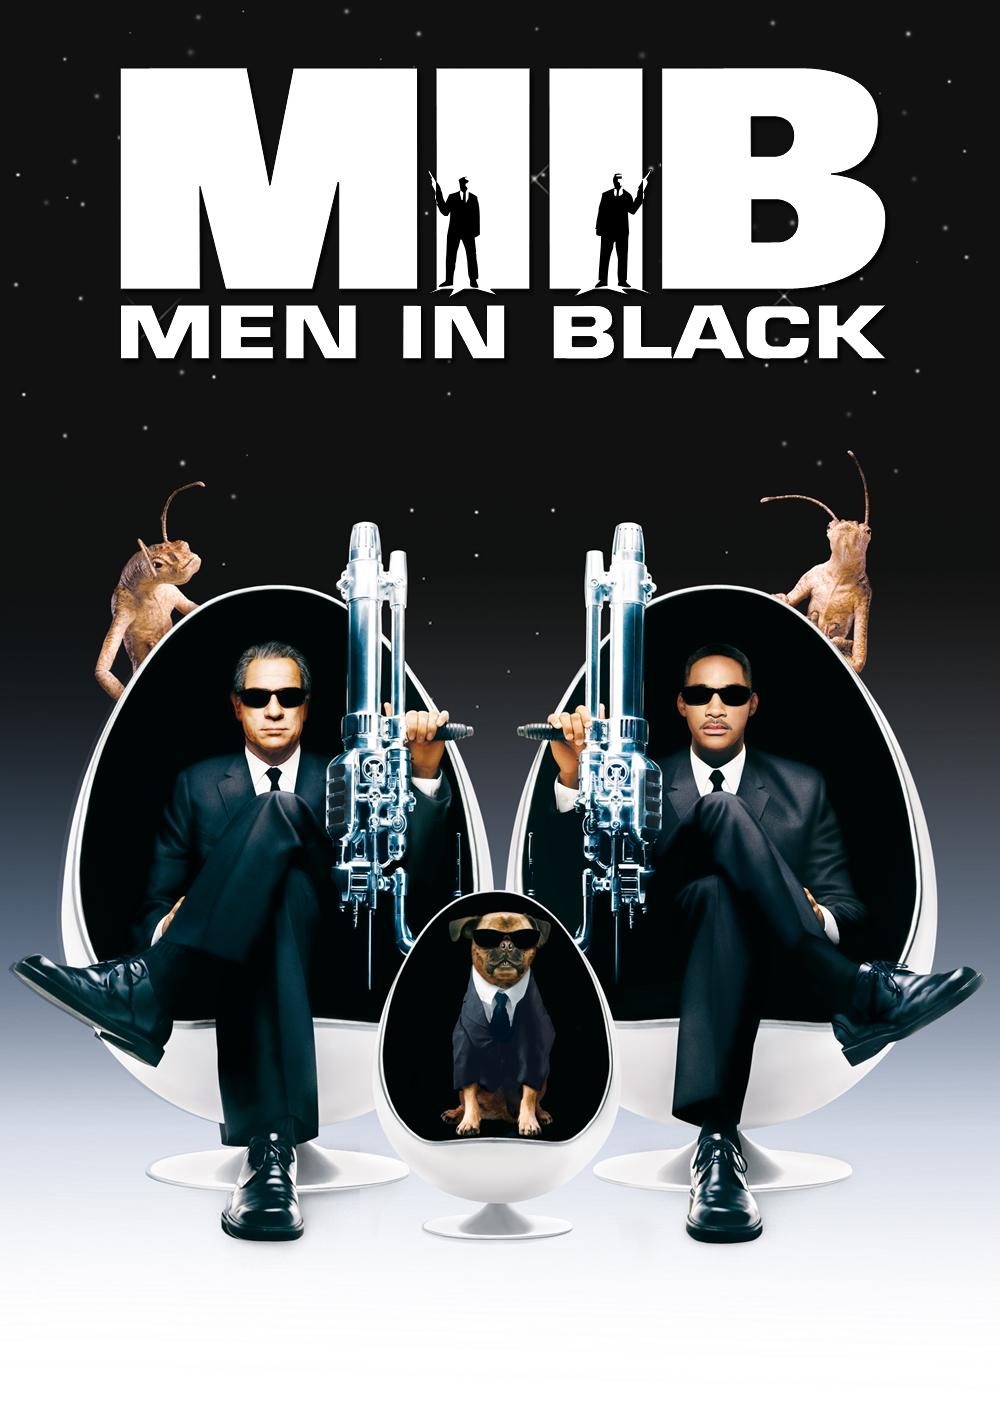 Men in Black 2 (2002) ταινιες online seires xrysoi greek subs